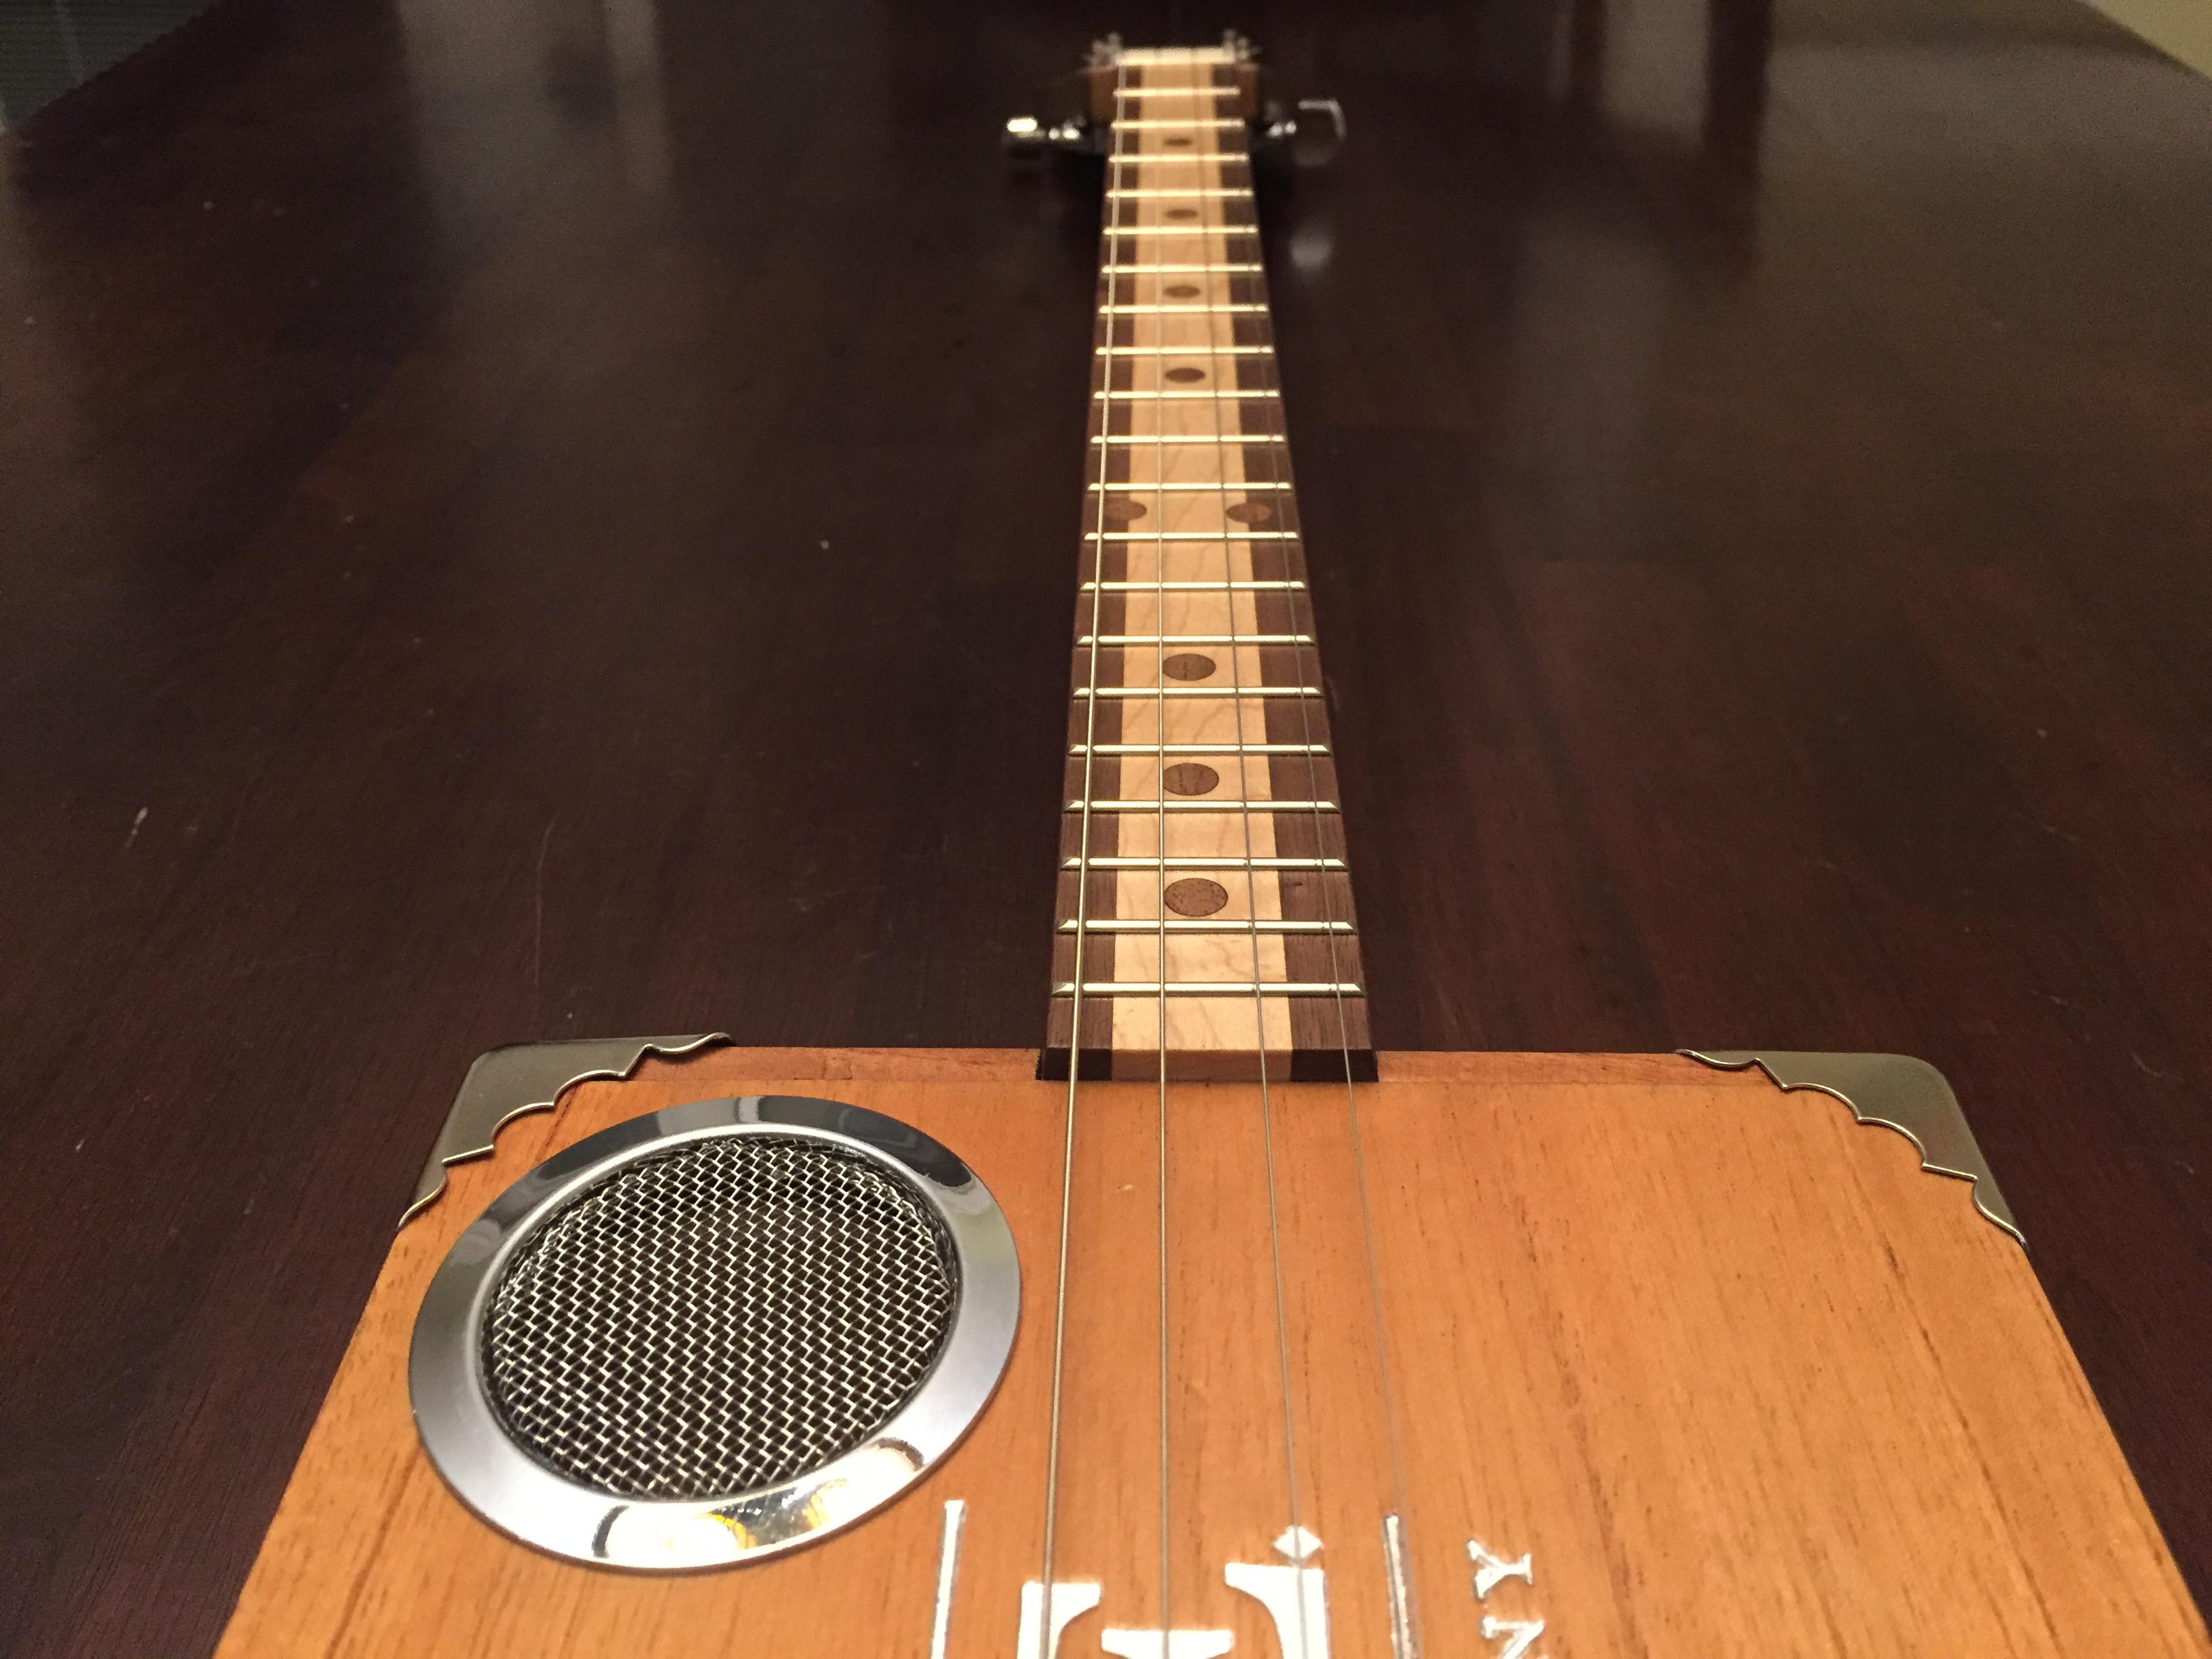 CLE Cigar Box Guitar Build - Fretboard detail